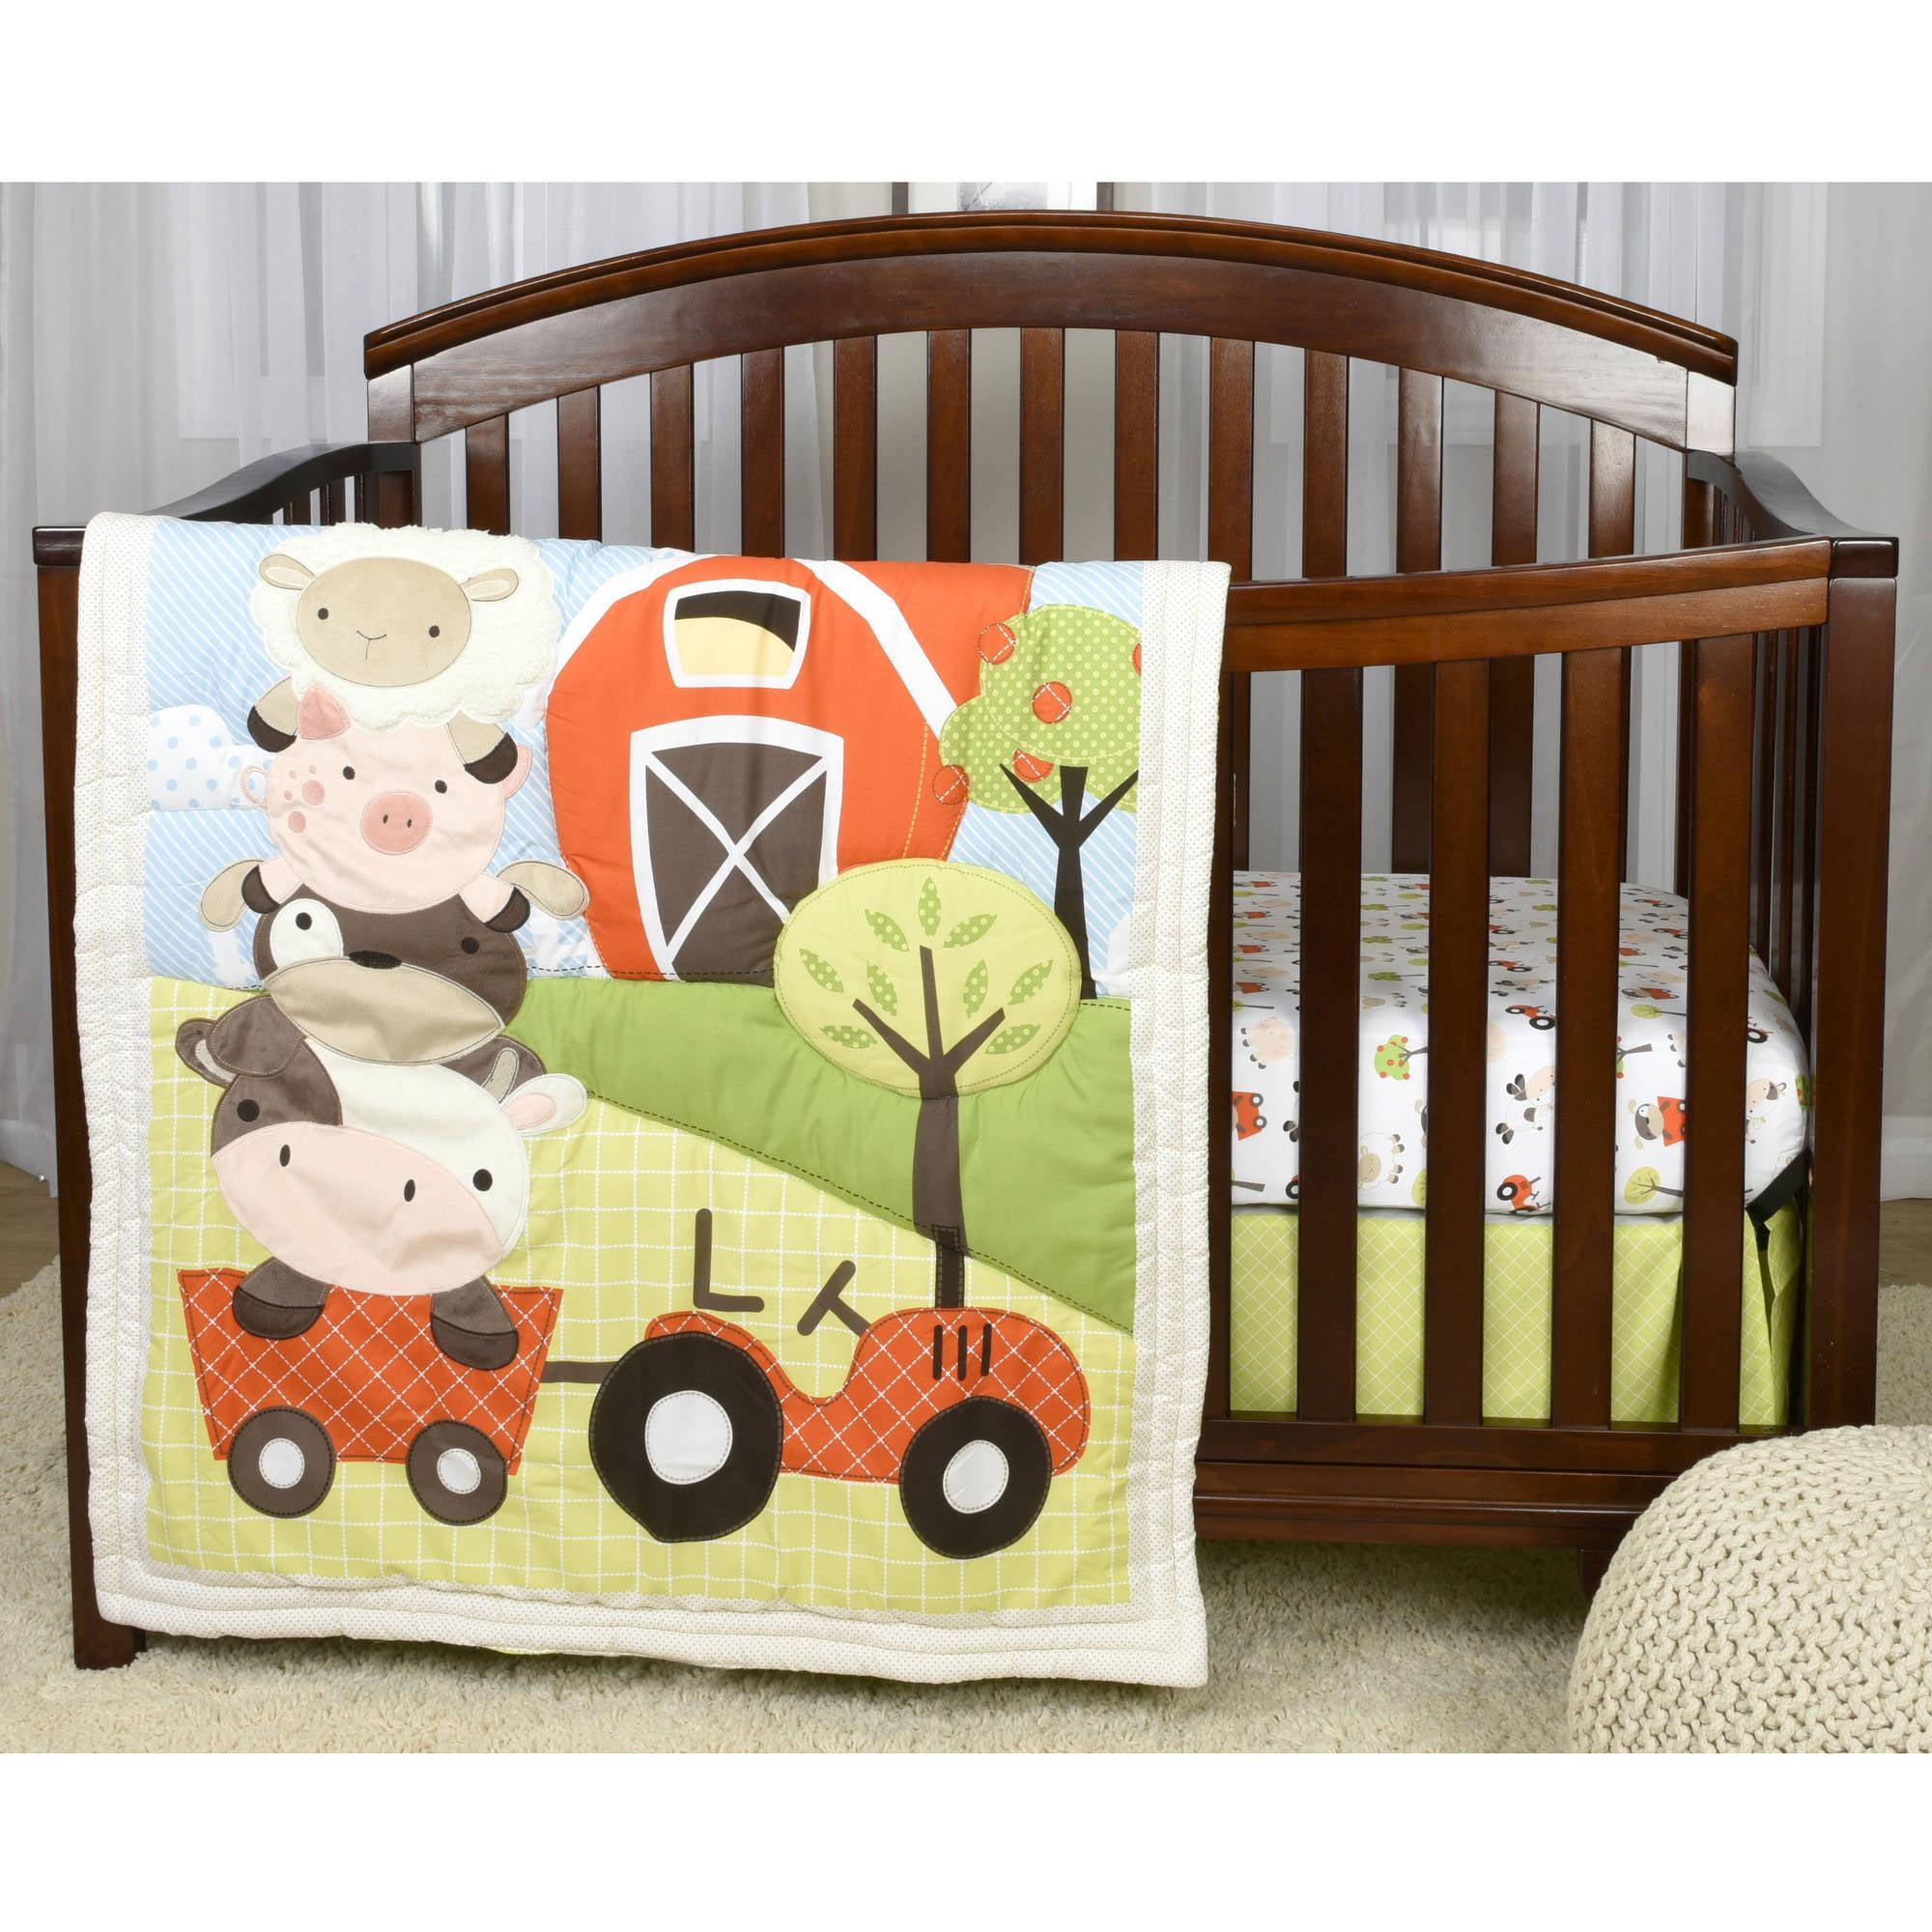 Baby's First by Nemcor McDonalds Farm 3-Piece Crib Bedding Set